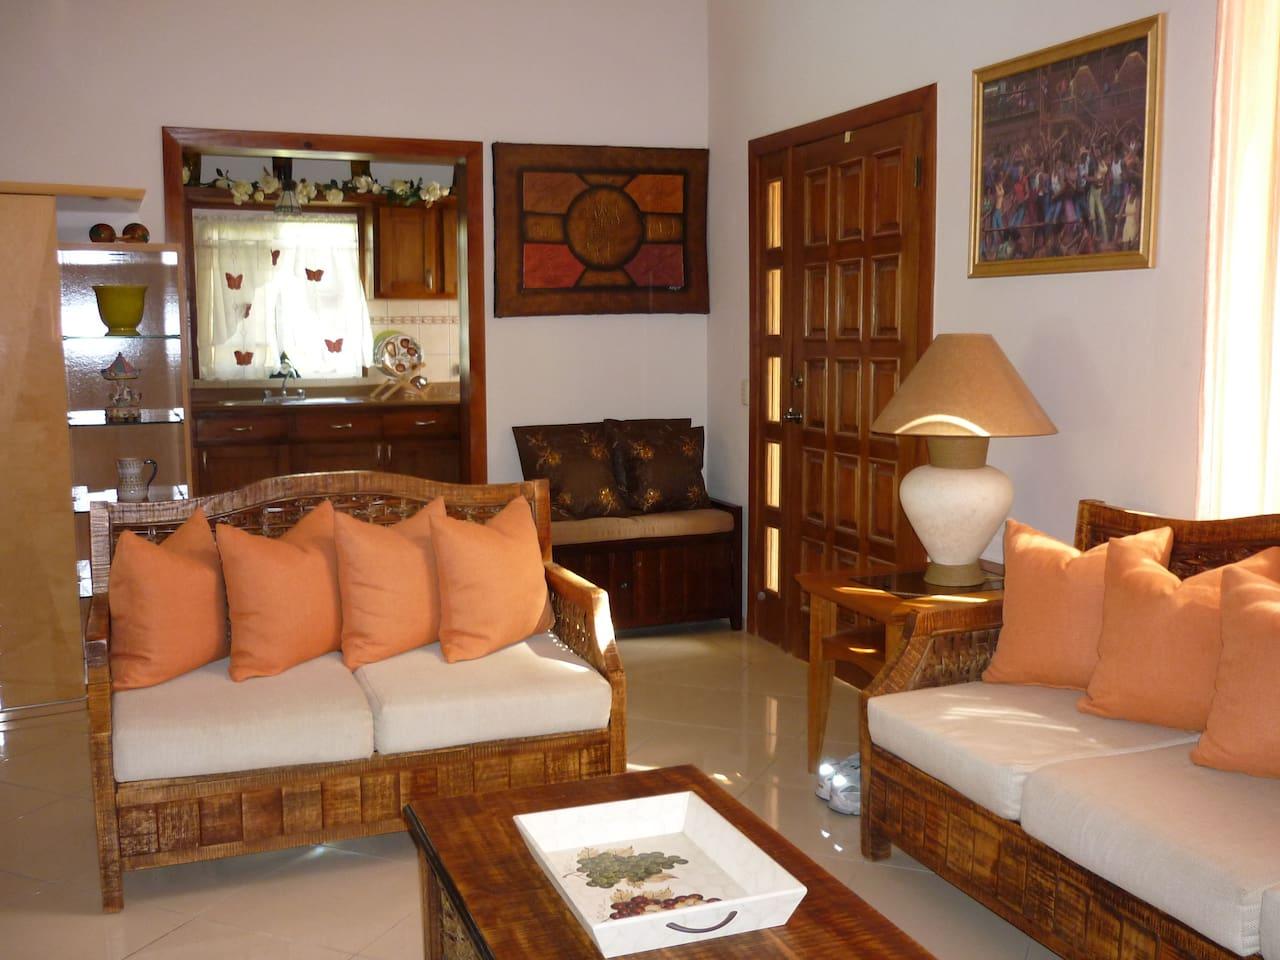 Dominican Republic Bed and Breakfast Villa